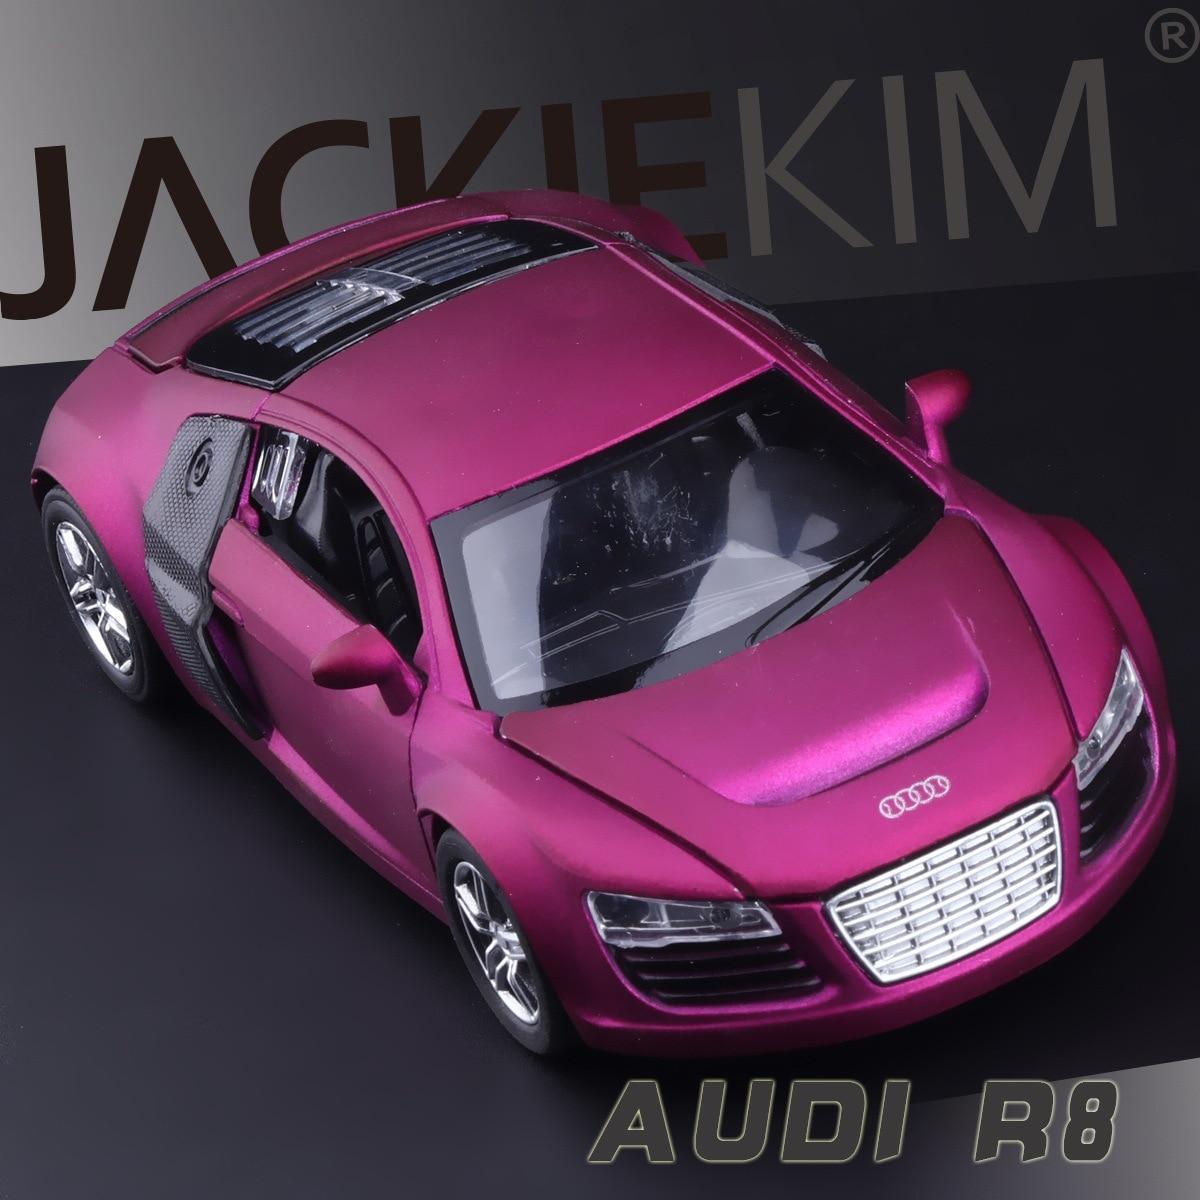 hot sale life 132 audi r8 alloy models cars models kids toys wholesale metal